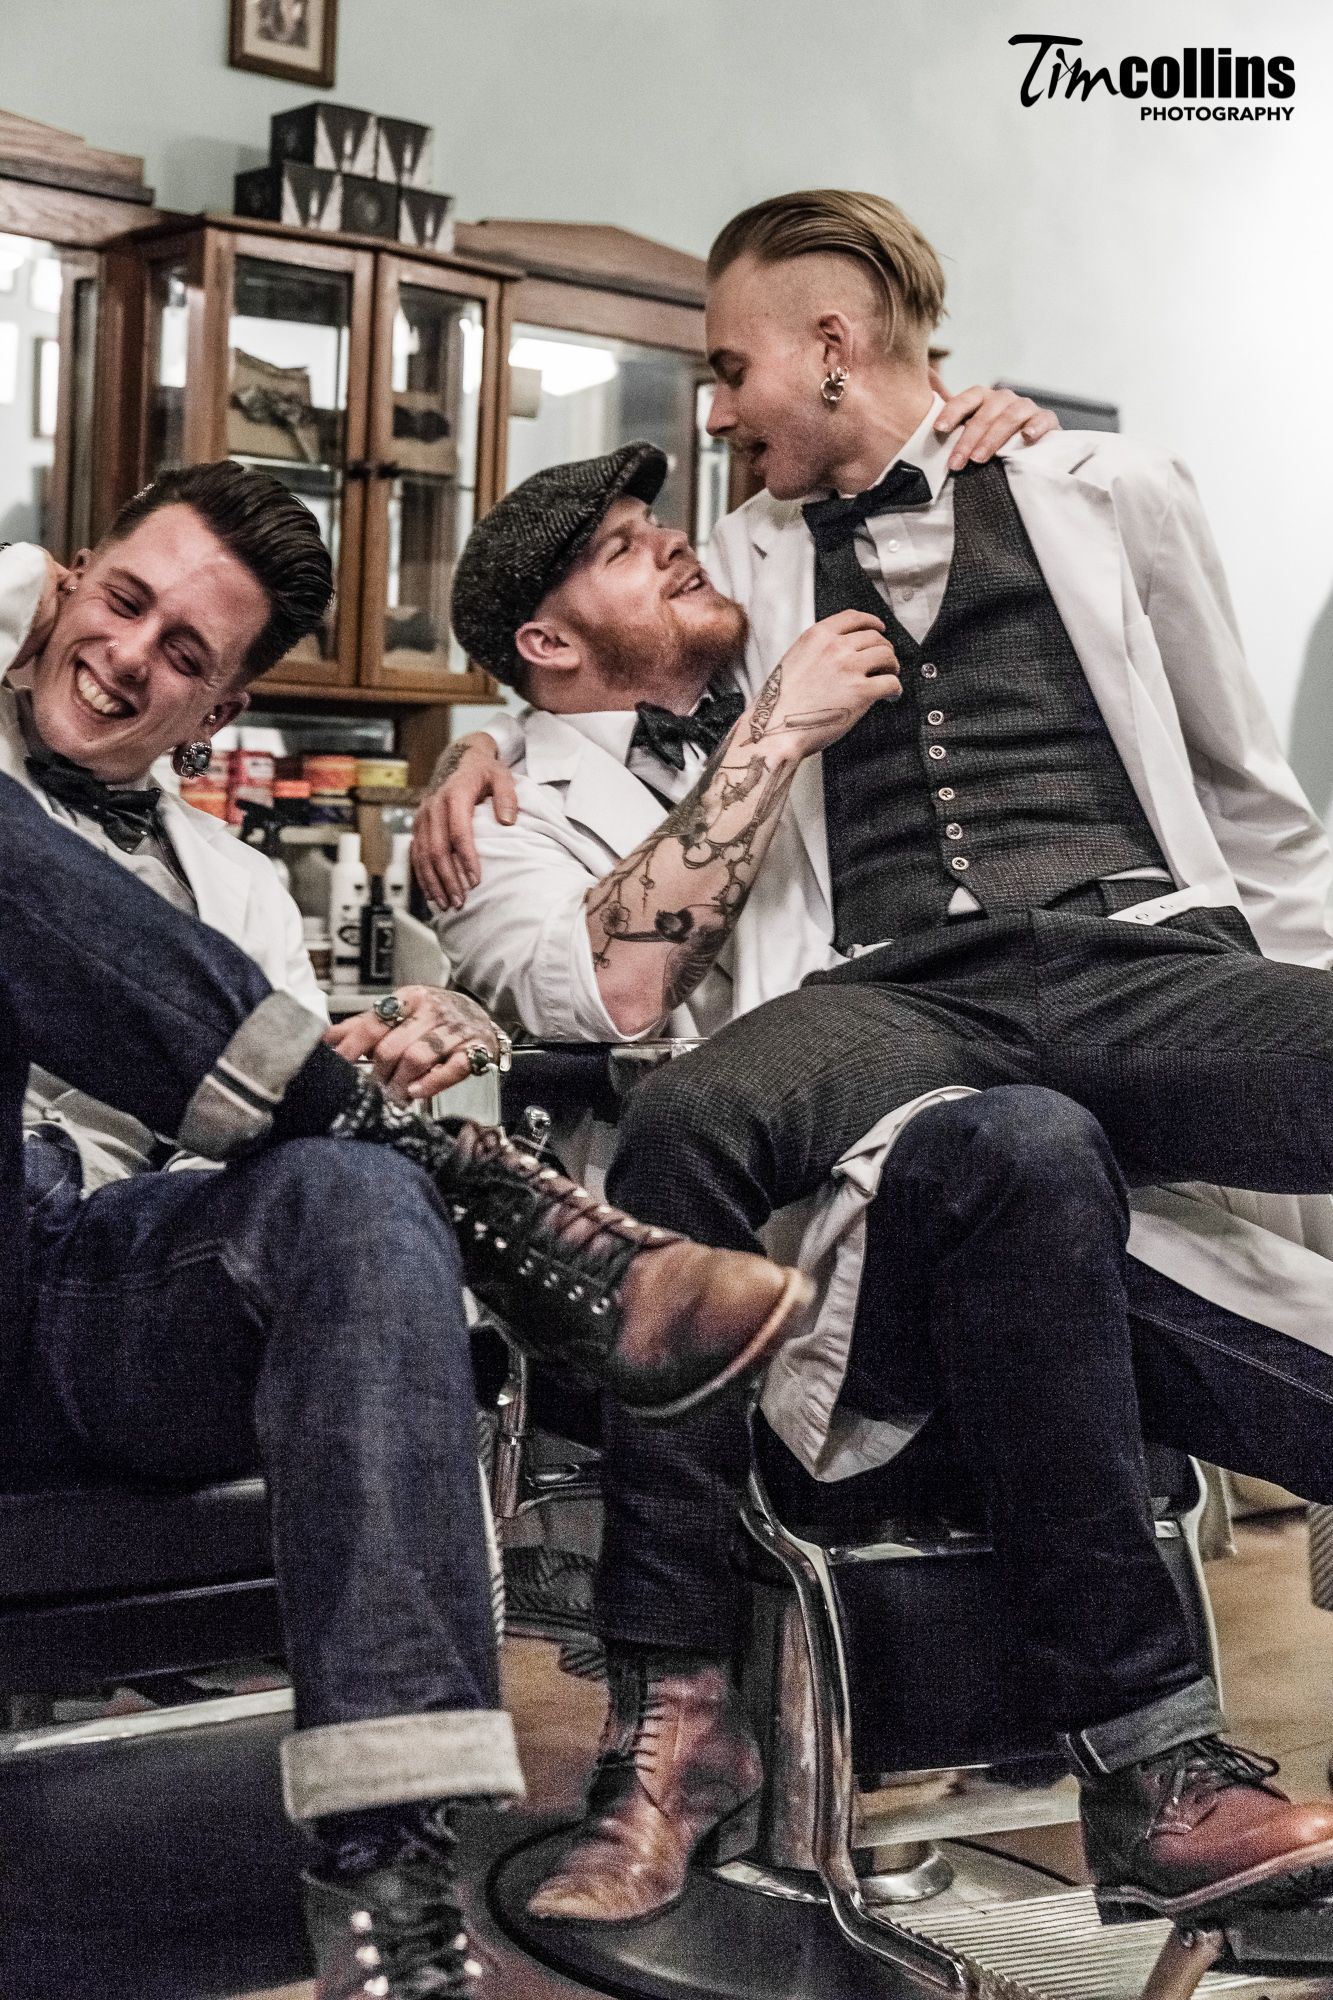 41c44756d9d53 Amsterdam Barber Shop - Haarbarbaar - Tim Collins Photography ...